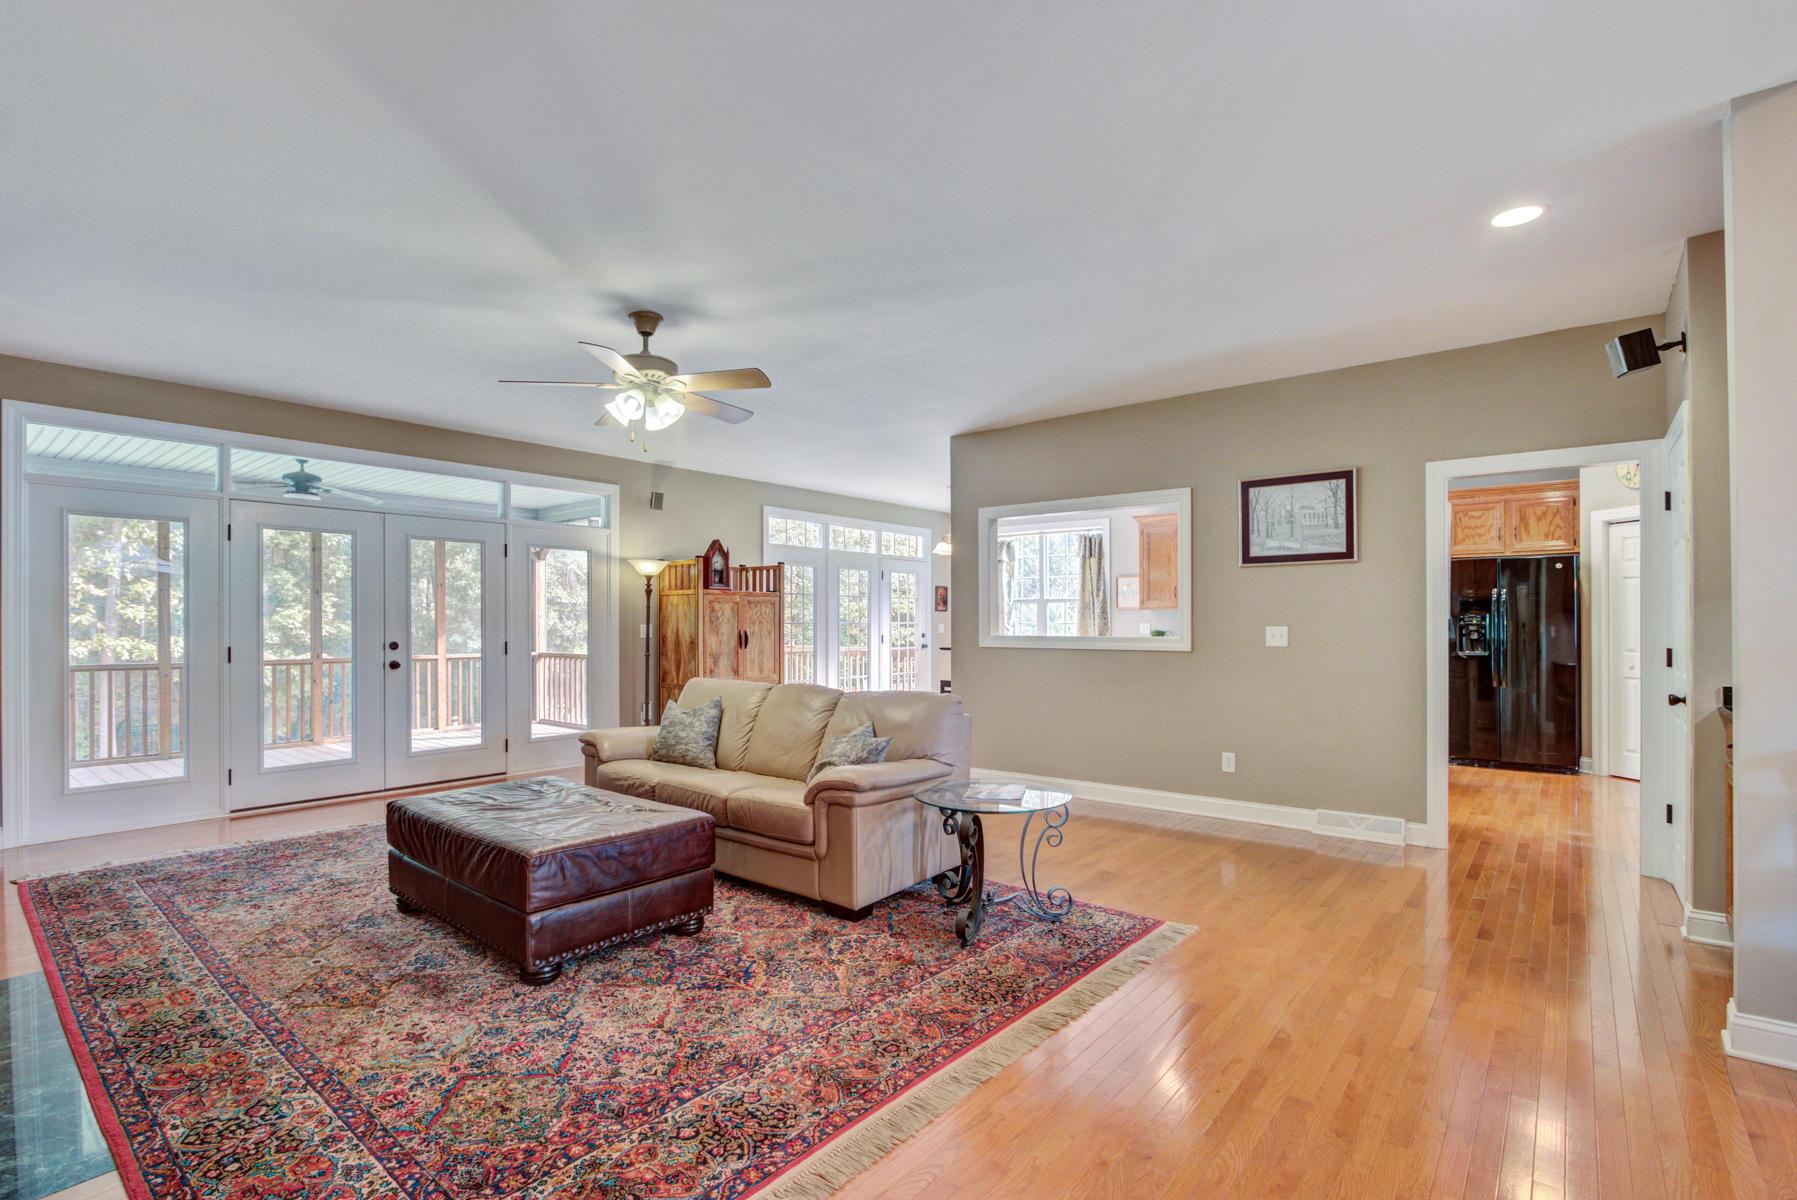 Cedar Grove Homes For Sale - 8733 Millerville, North Charleston, SC - 7